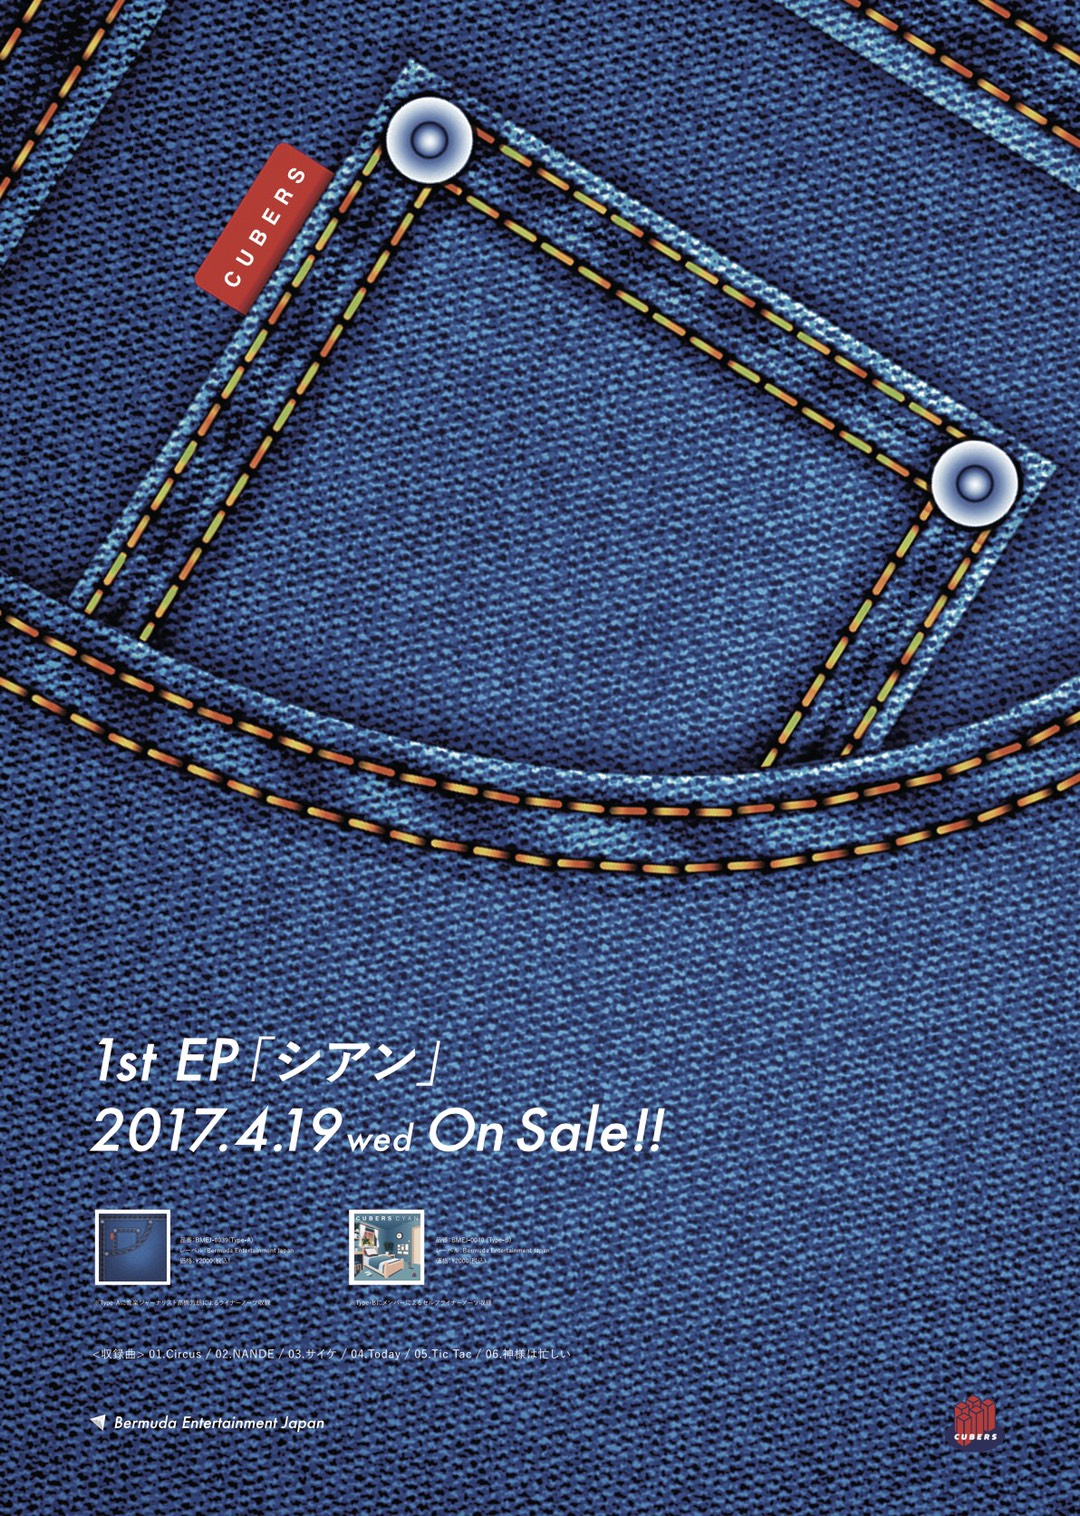 【NEWS】5月27日(土)ららぽーと横浜 フリーライブ限定でライブ撮影OK!&シアンリリースイベントTOUR SEMI FINAL&FINALのスペシャル特典会開催について